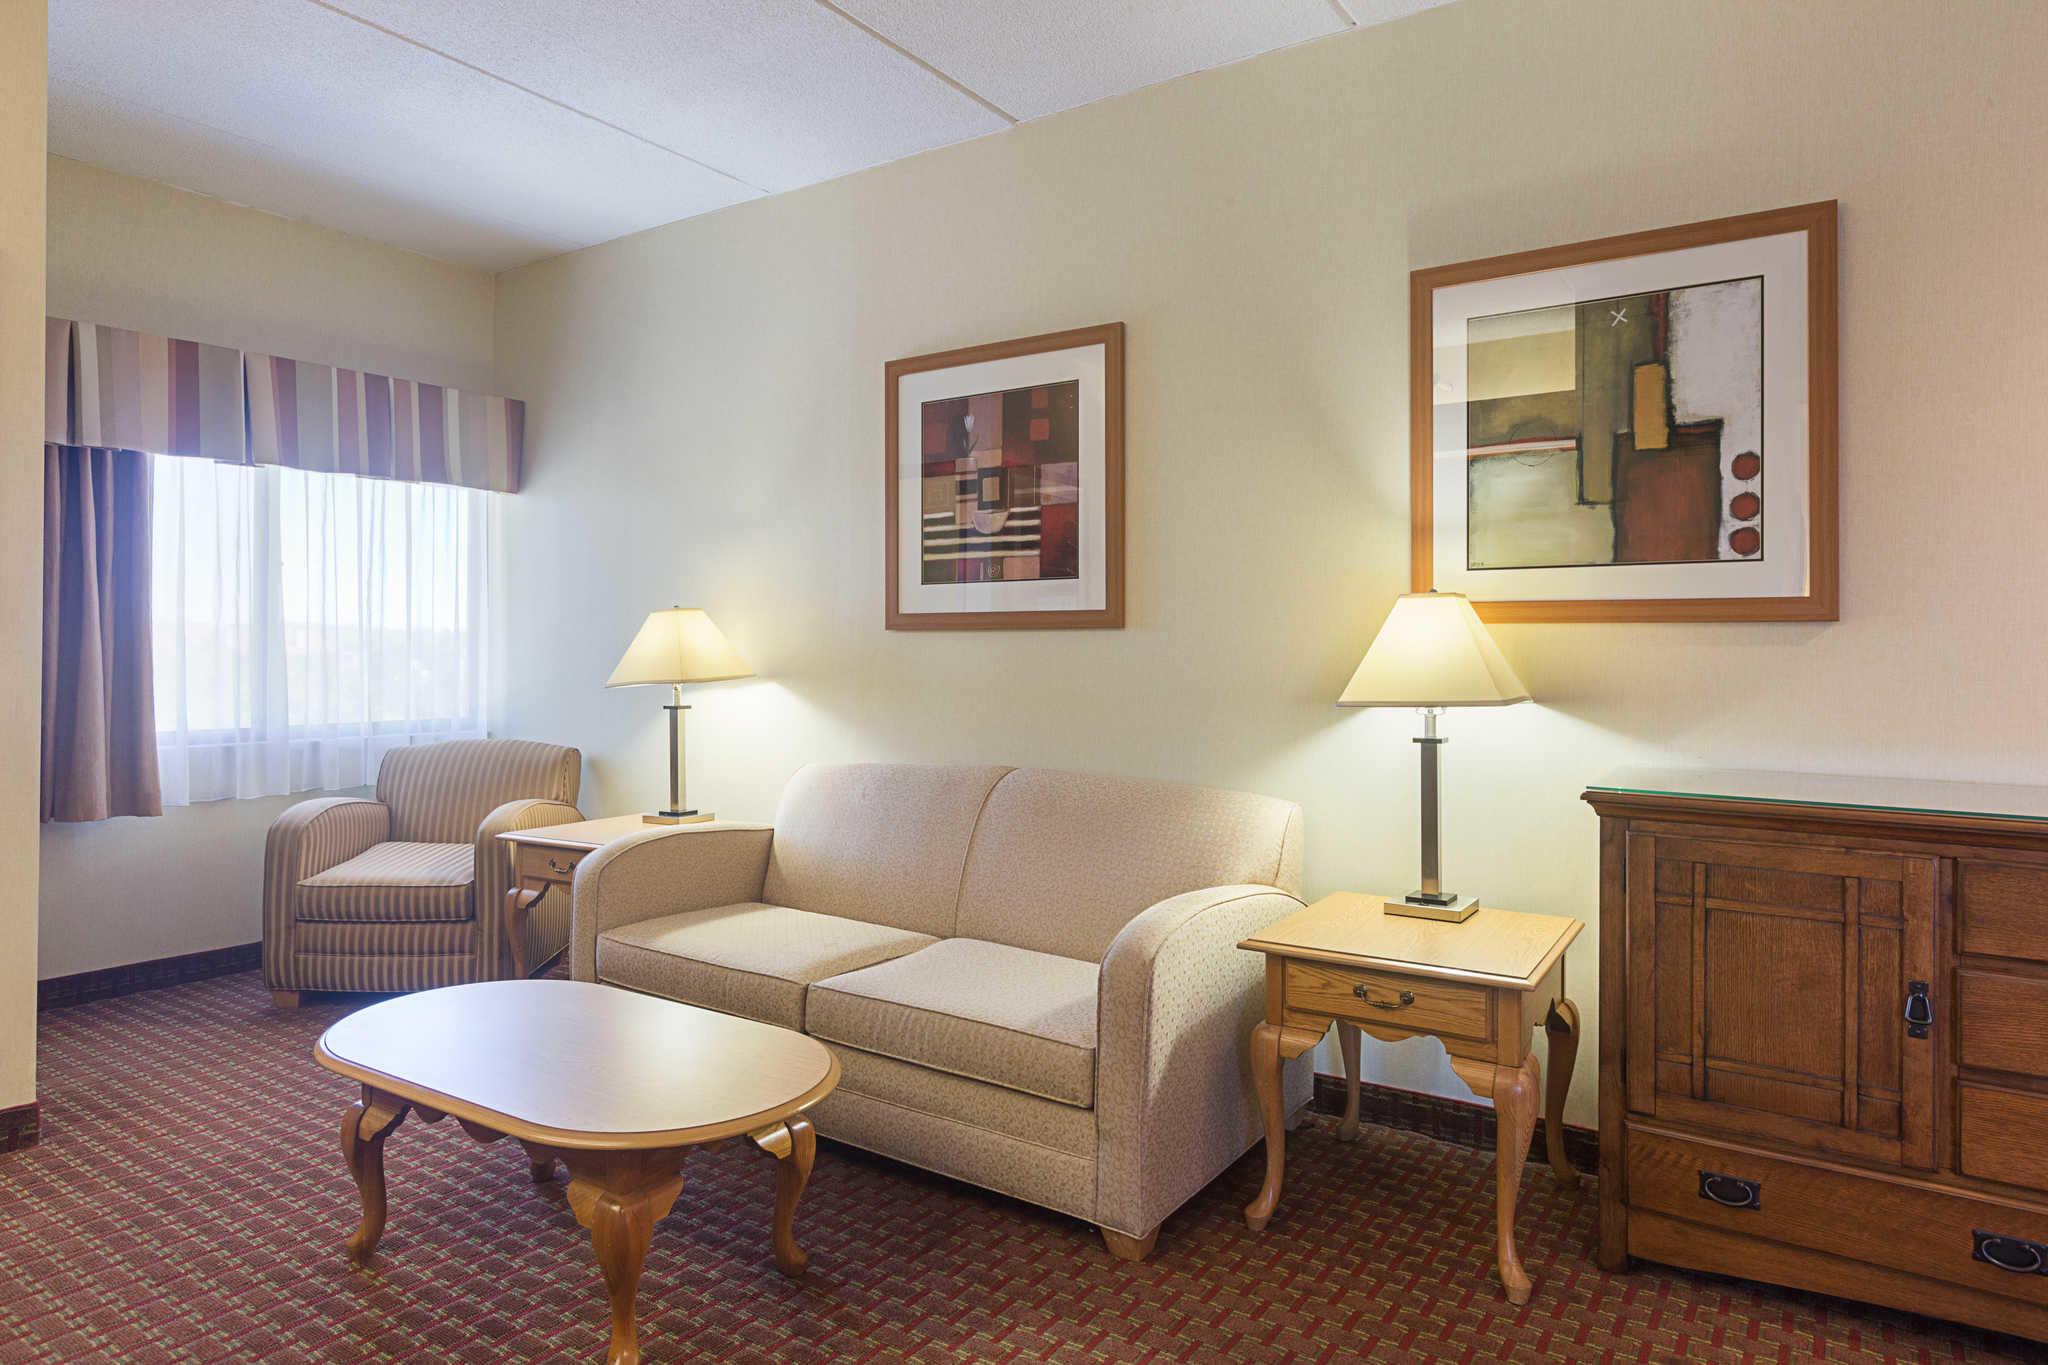 Quality Suites image 29